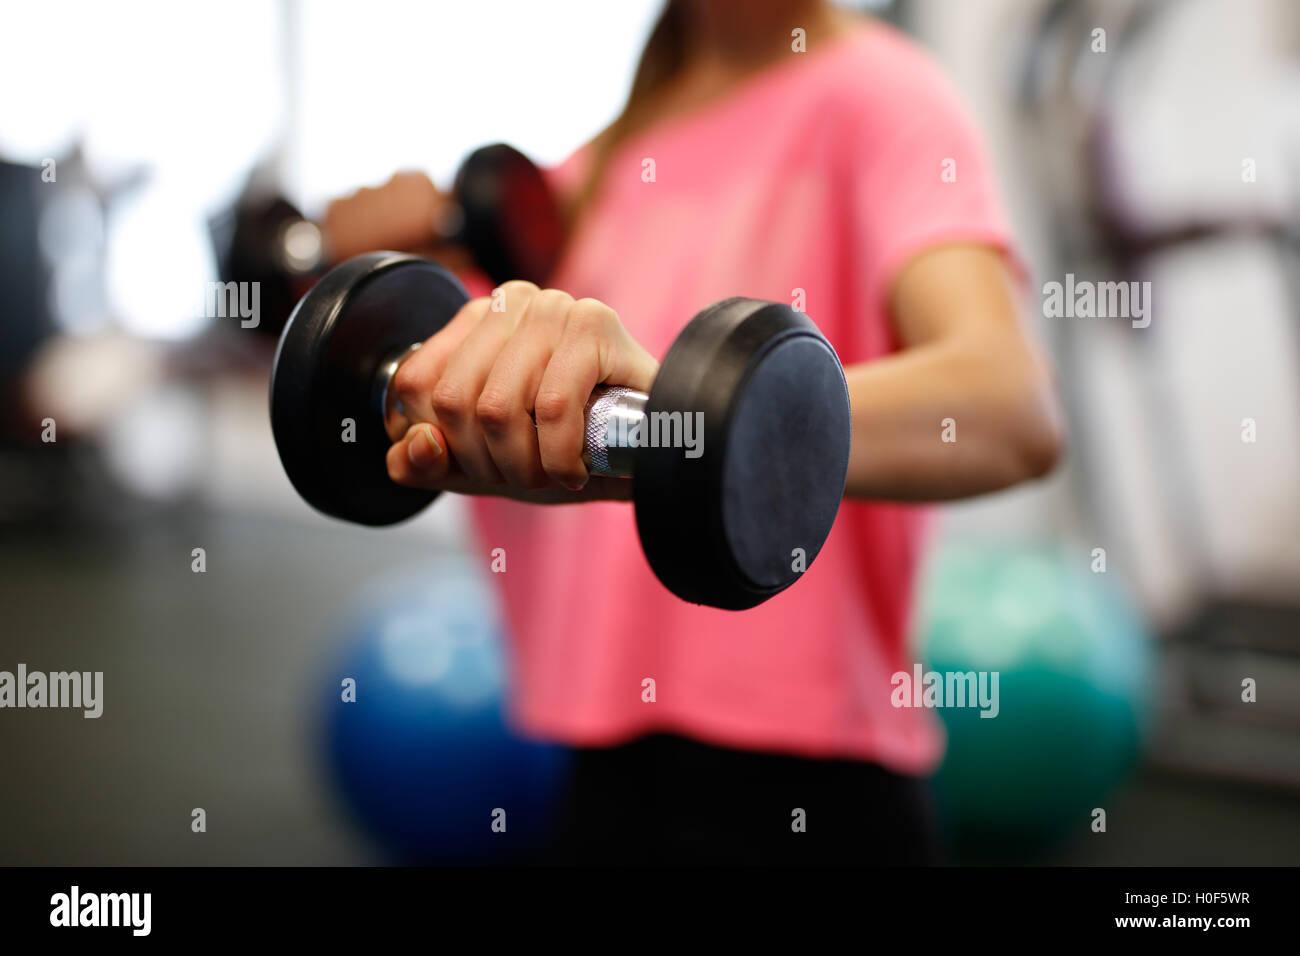 Frau am Sport Fitness Fitnessstudio Krafttraining für Schönheit Körper. Fitness Mädchen mit Stockbild